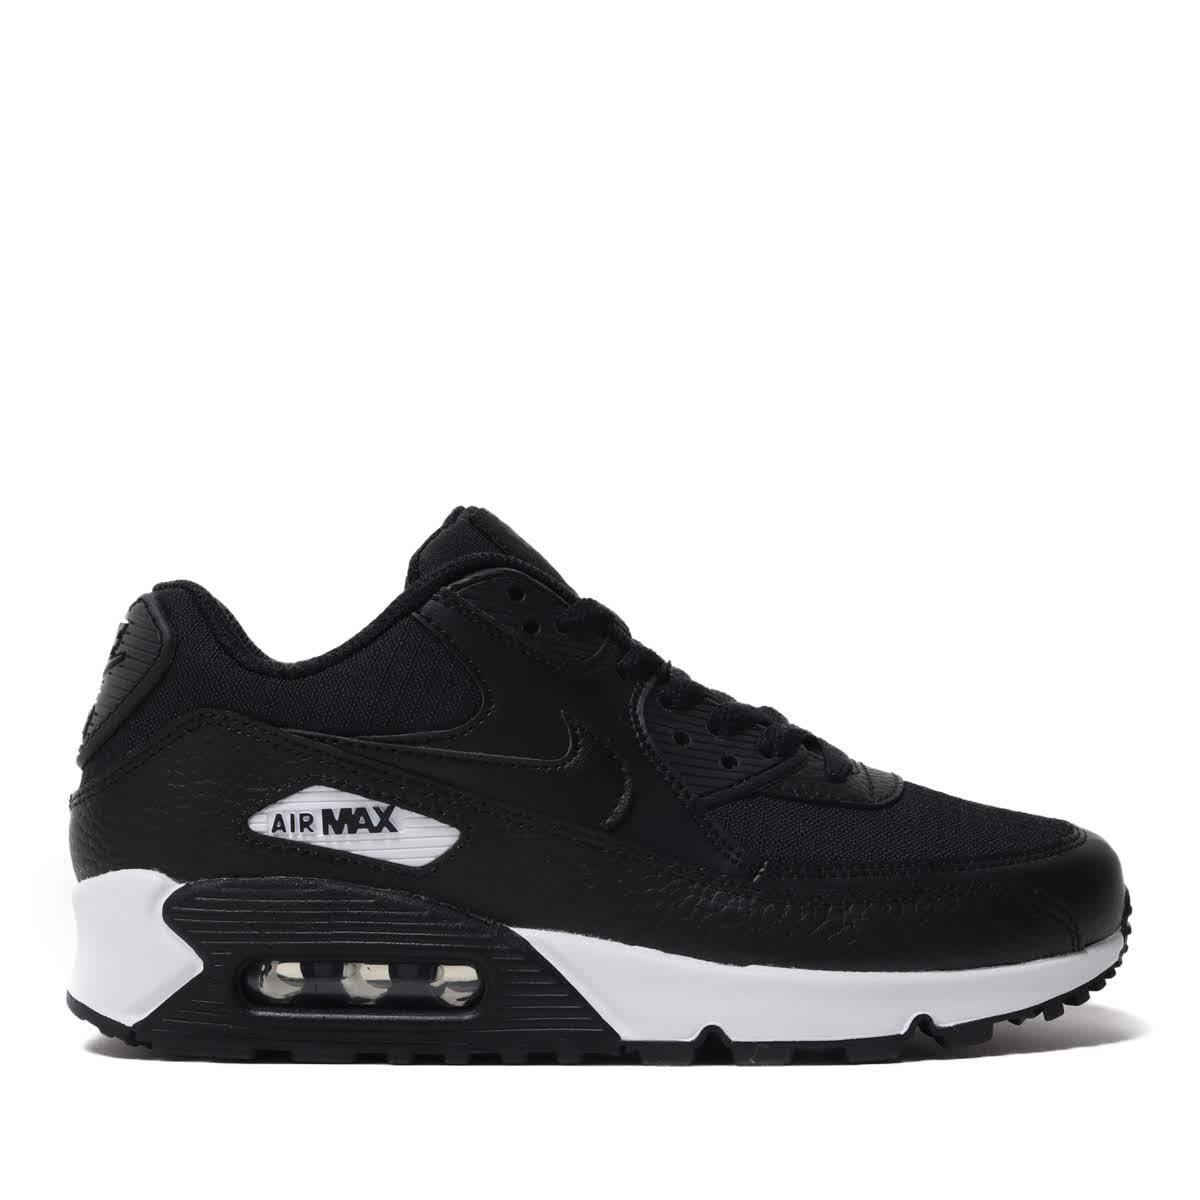 Nike WMNS Air Max 90 Ultra Premium Beige, Black | 859522 100